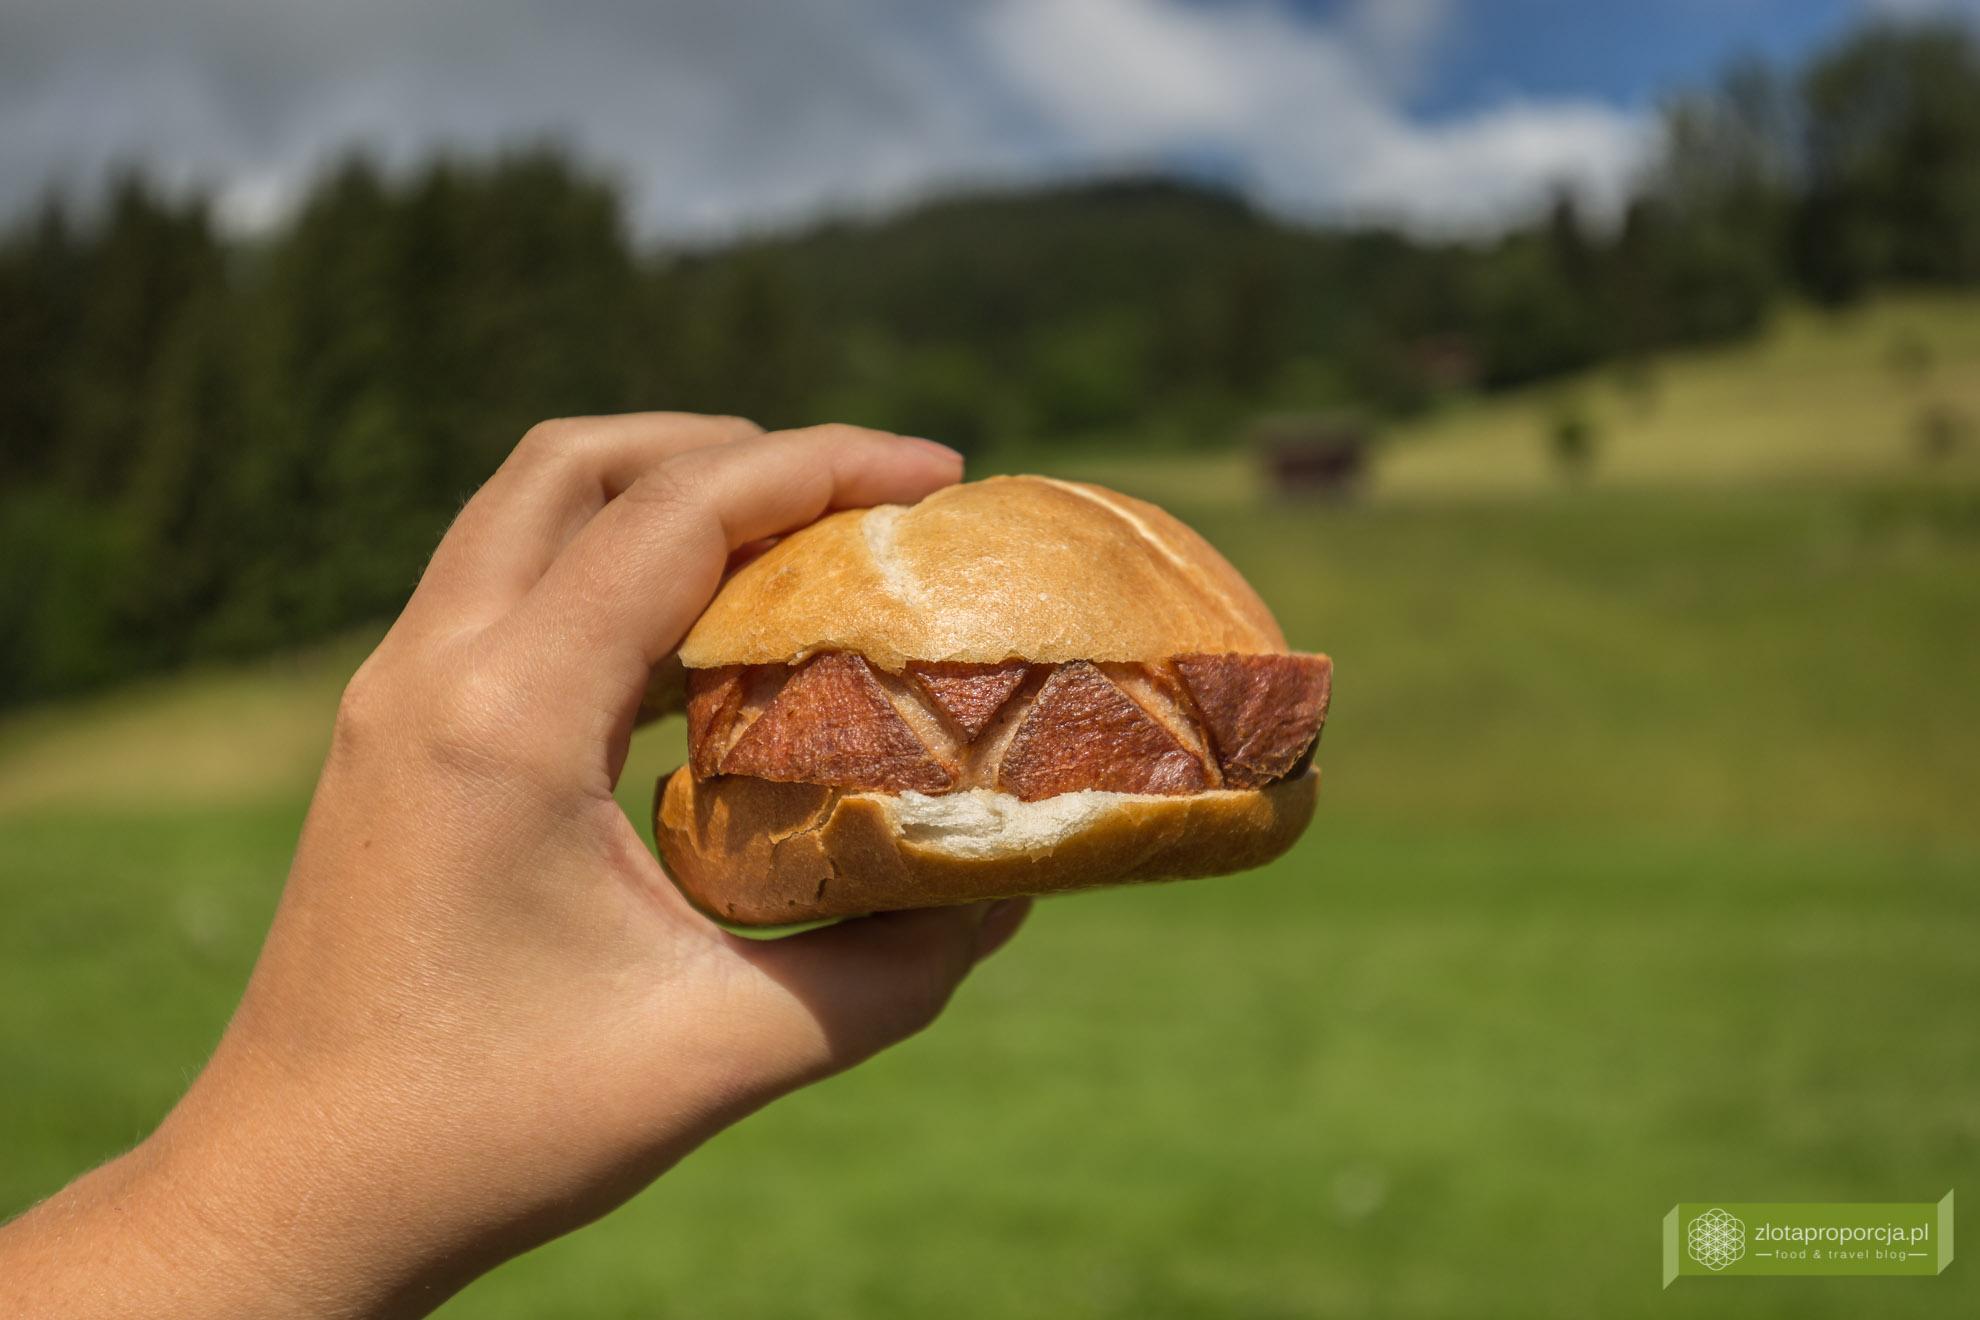 kuchnia bawarska, kuchnia Bawarii, bawarskie potrawy, Bawaria, Leberkäse, Leberkäsesemmel